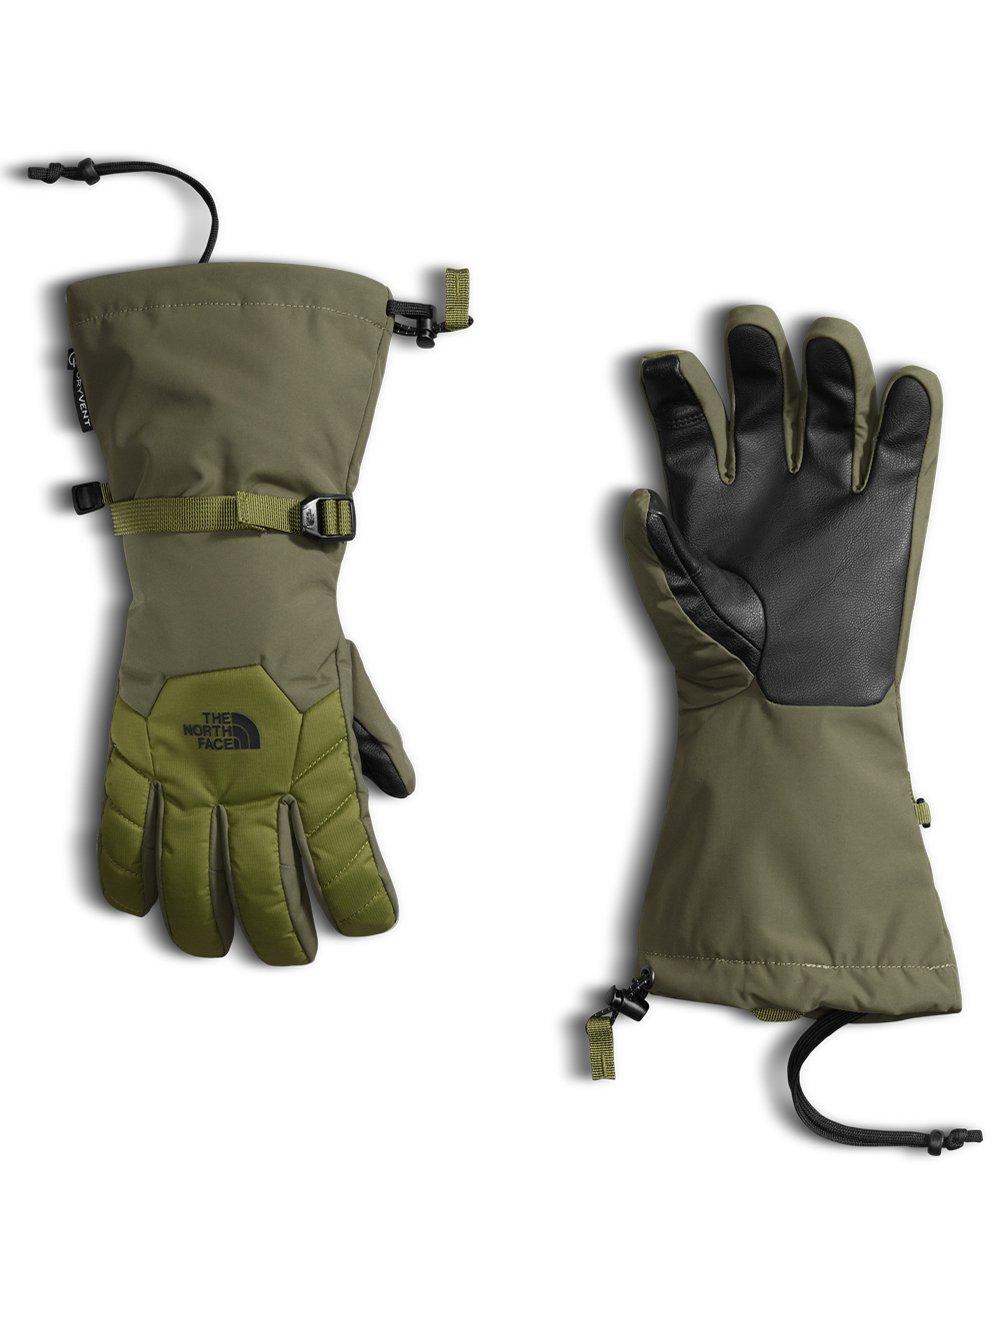 The North Face Boys' Revelstoke Etip Glove - burnt olive green/mayfly green, m